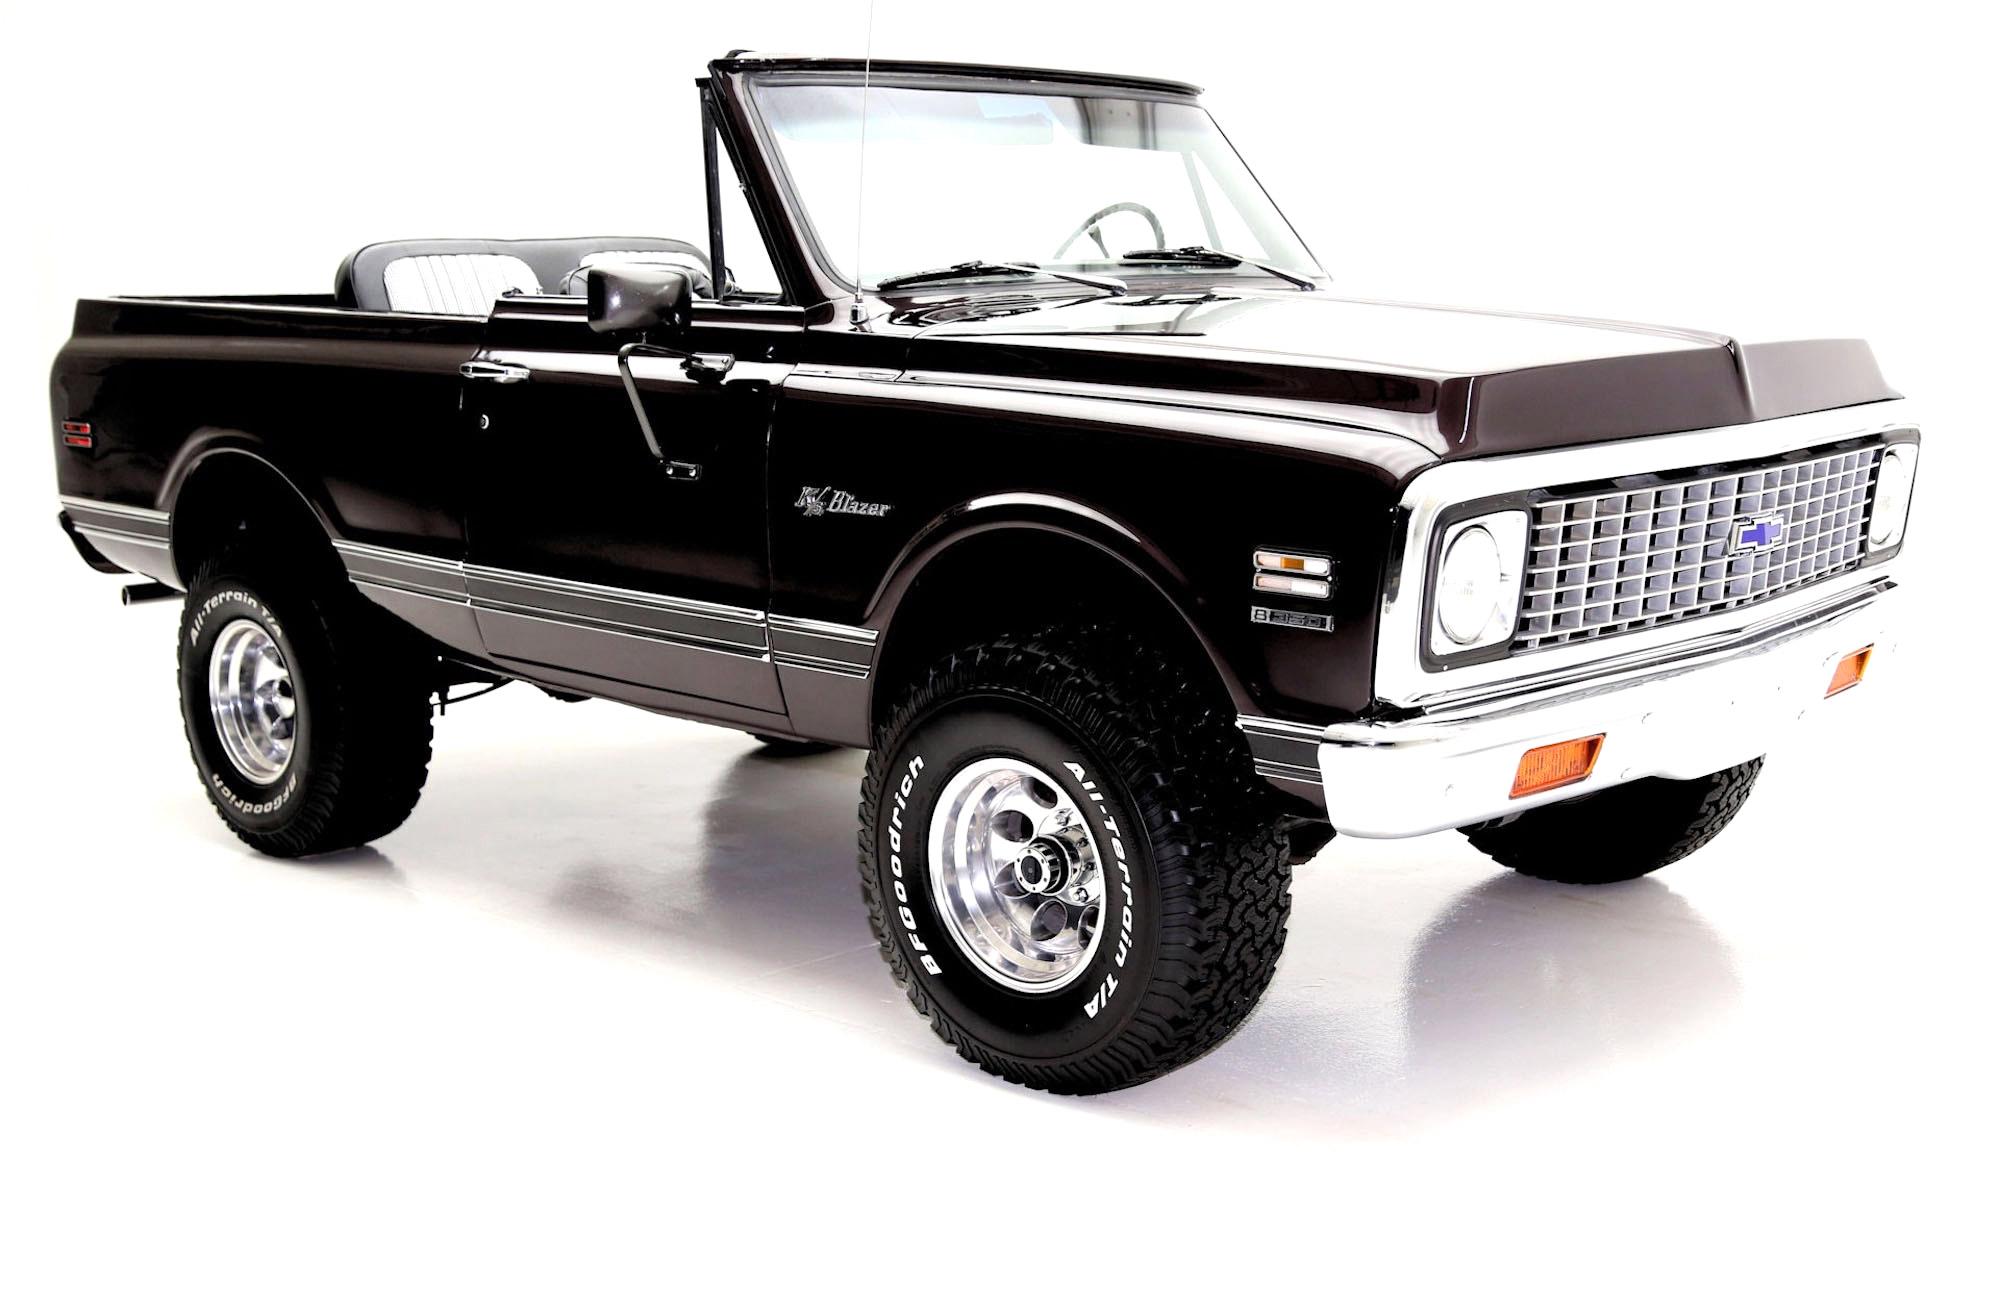 4-Wheel Classics/Classic Car, Truck, and SUV Sales